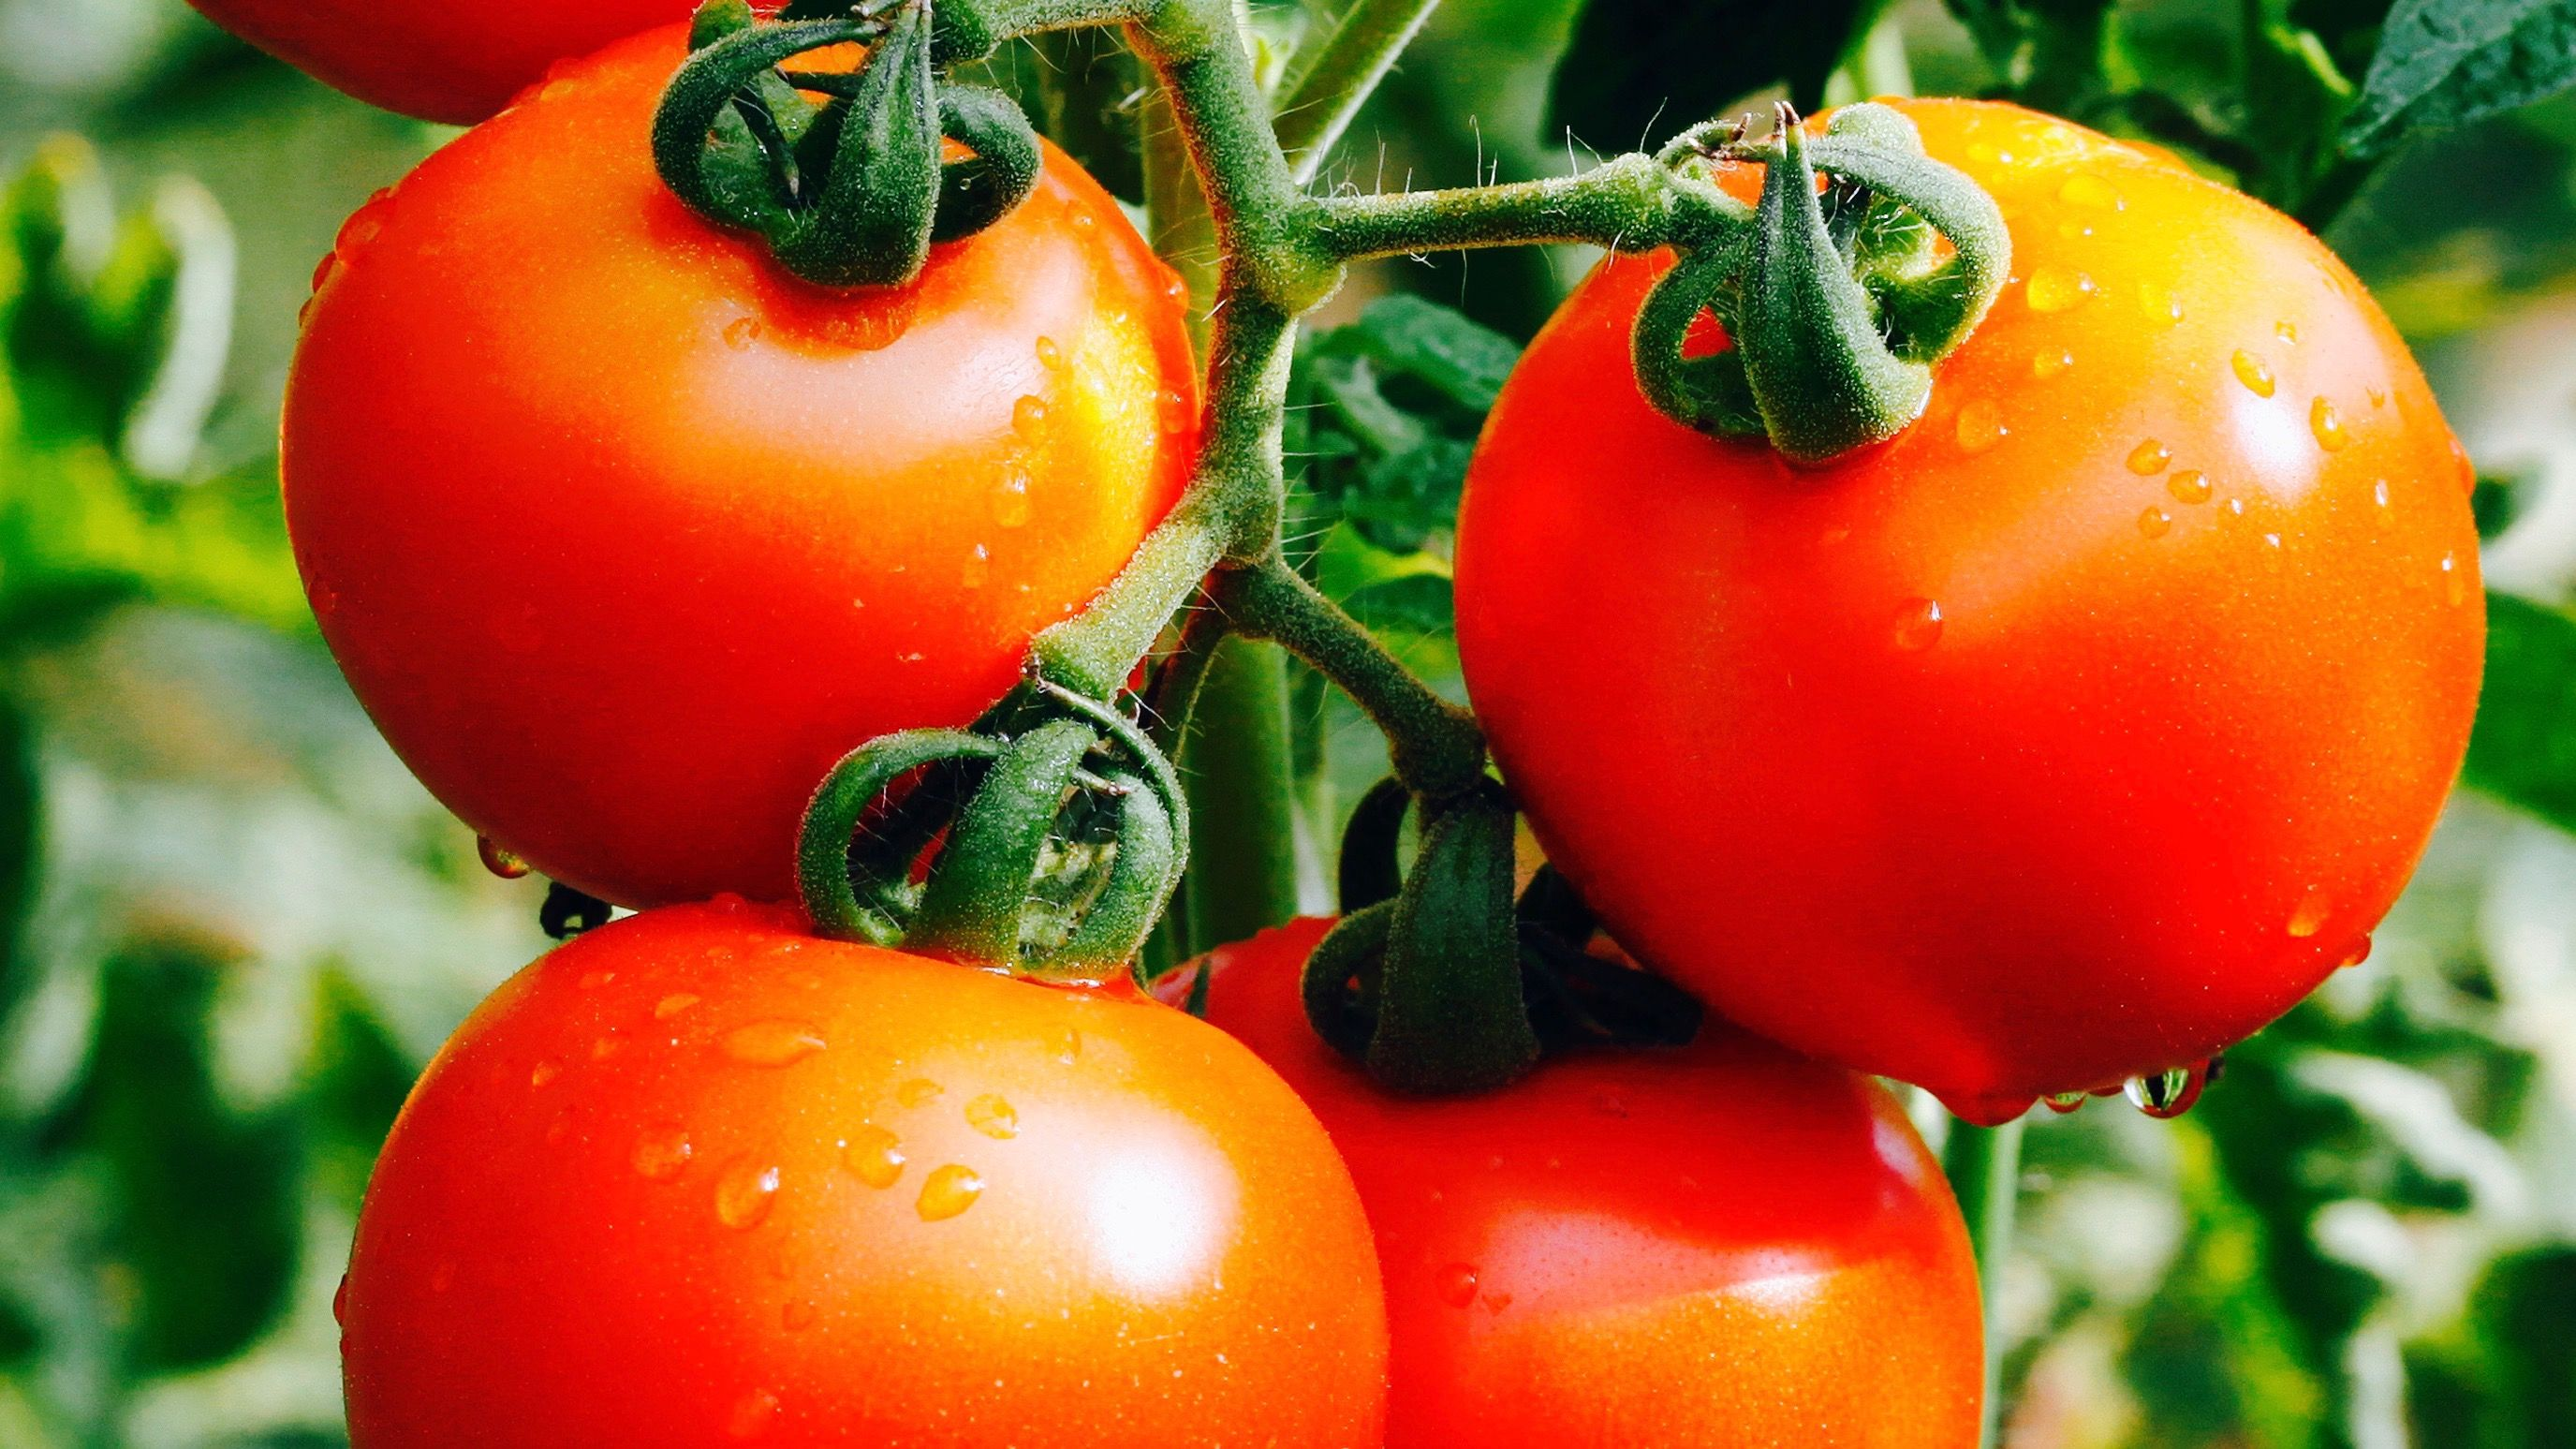 Geneticists edited tomato mutations with CRISPR tech — Quartz